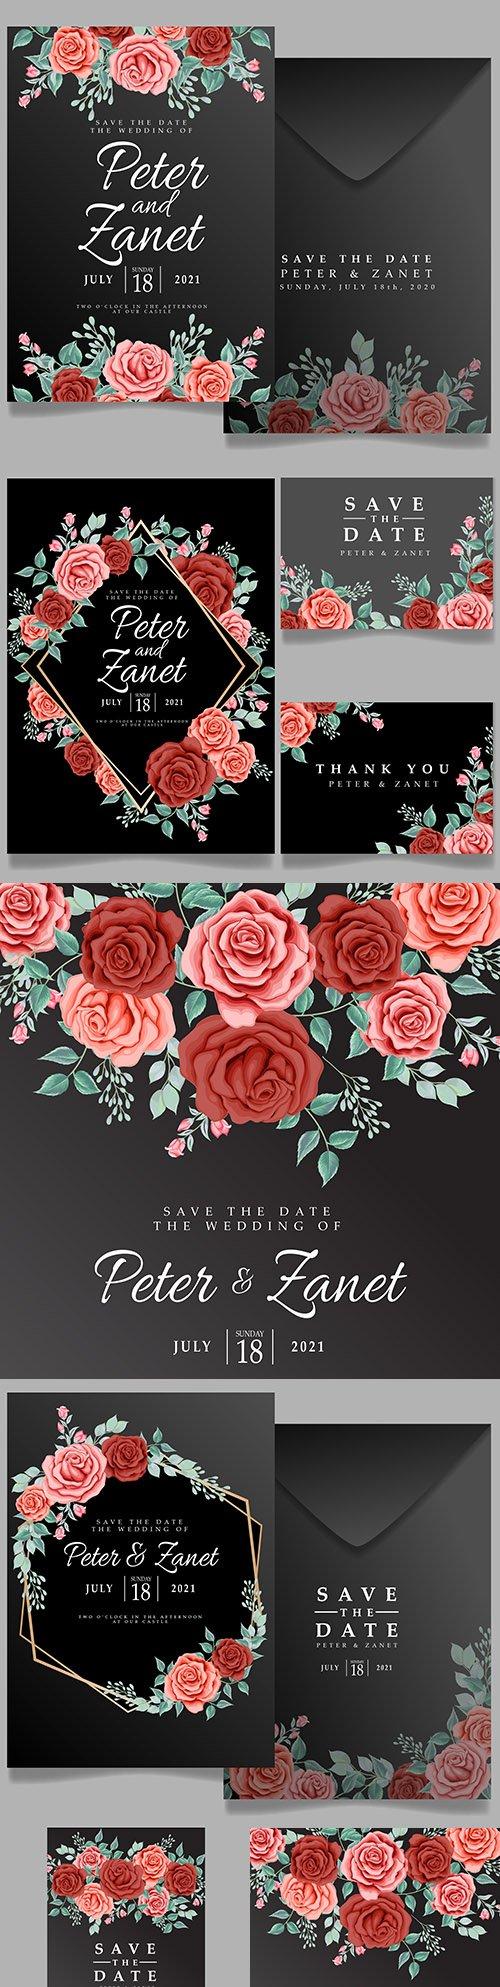 Beautiful rose flower wedding invitation black background